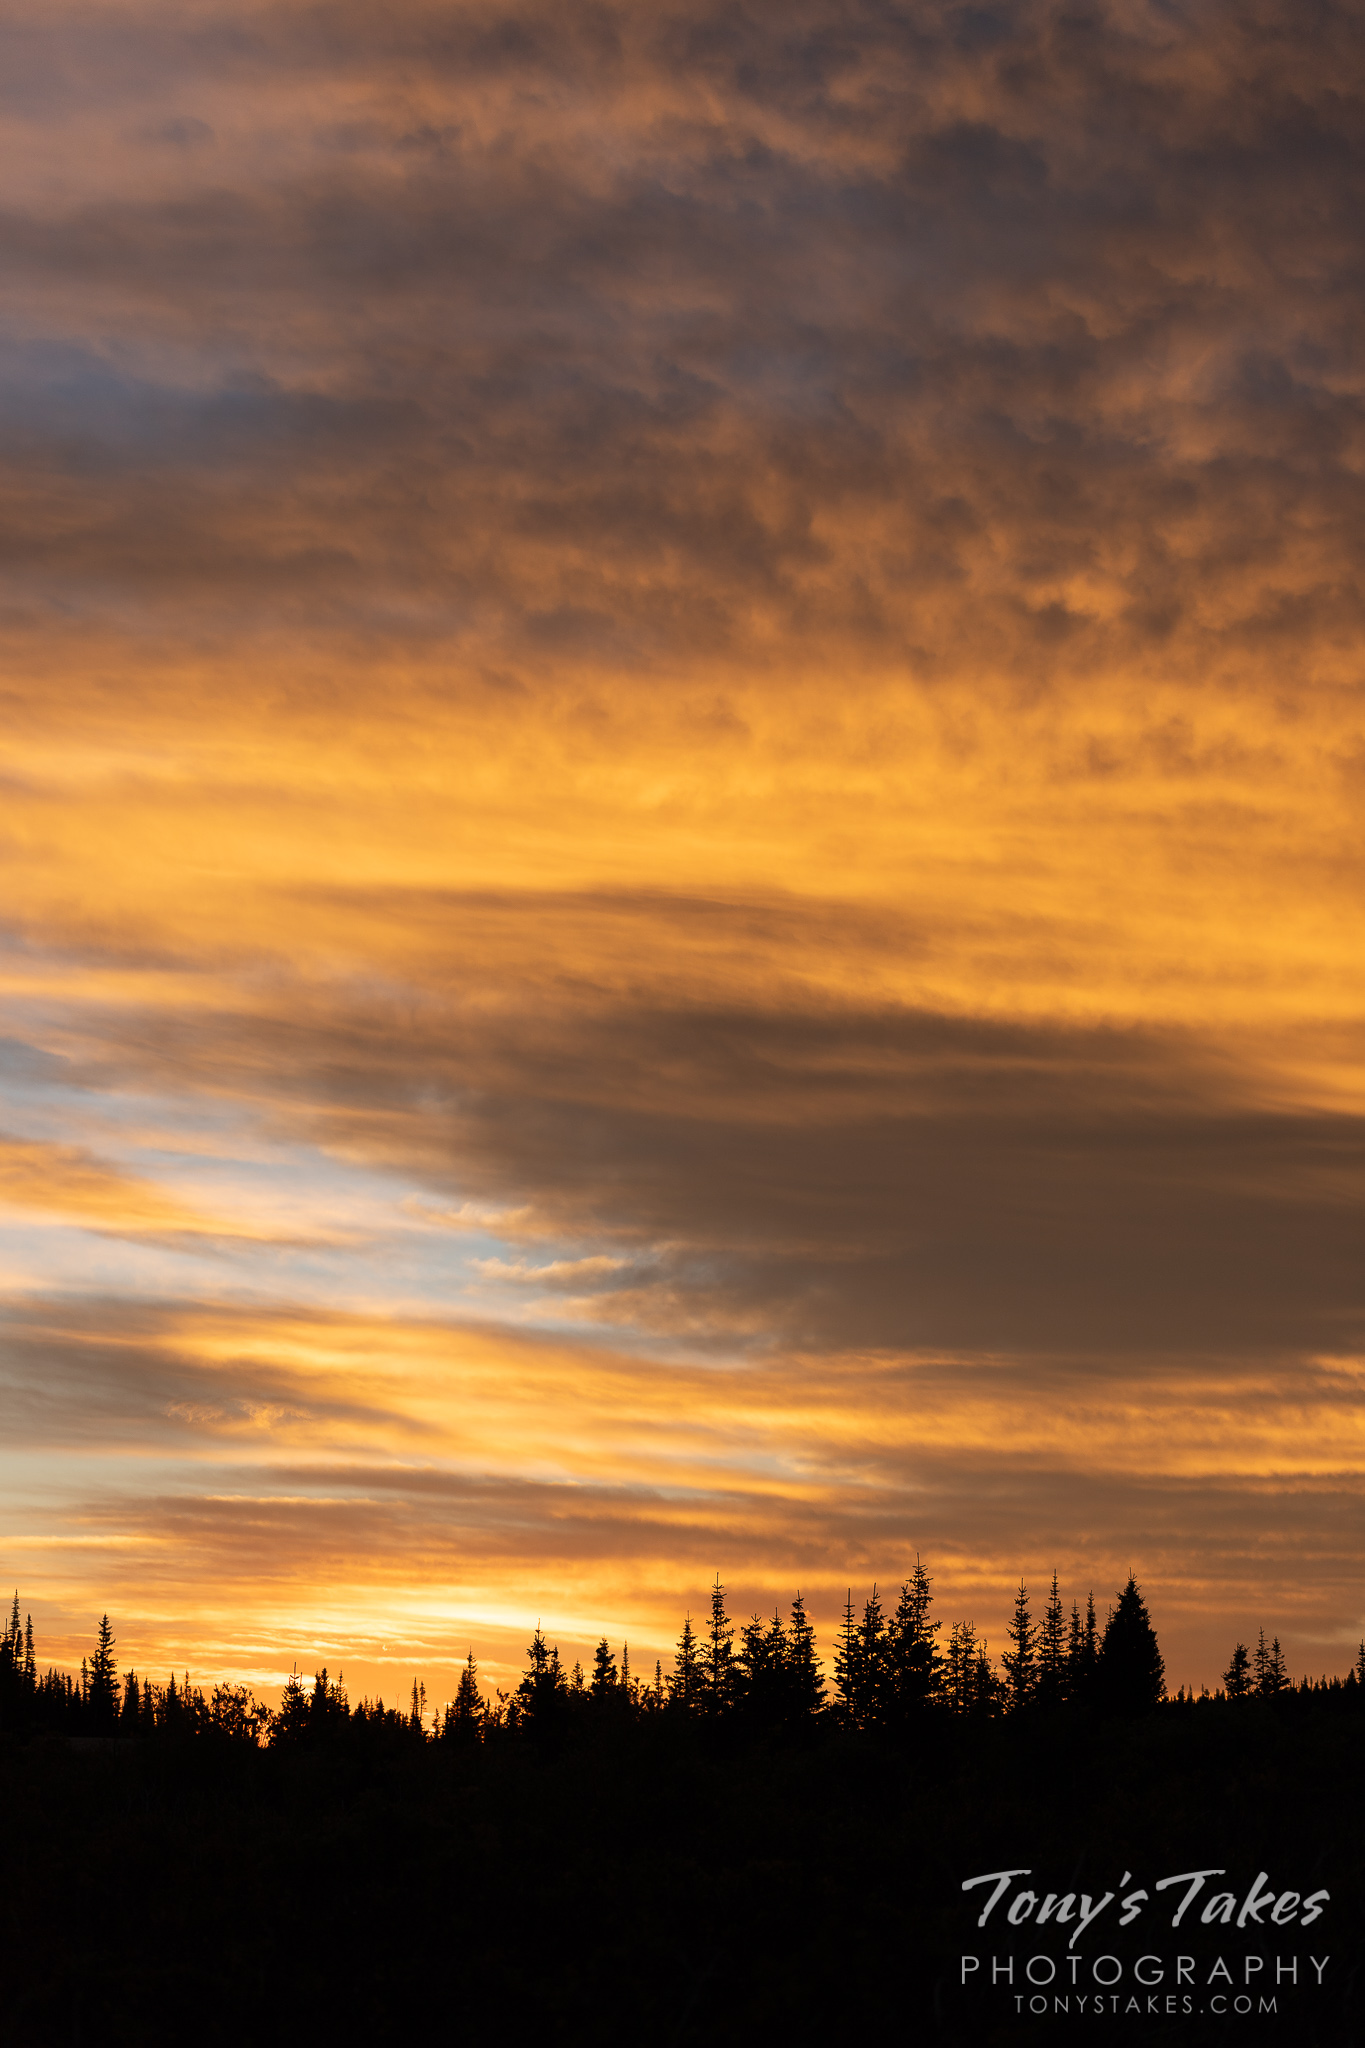 Sunrise illuminates the mountain clouds in orange. (© Tony's Takes)